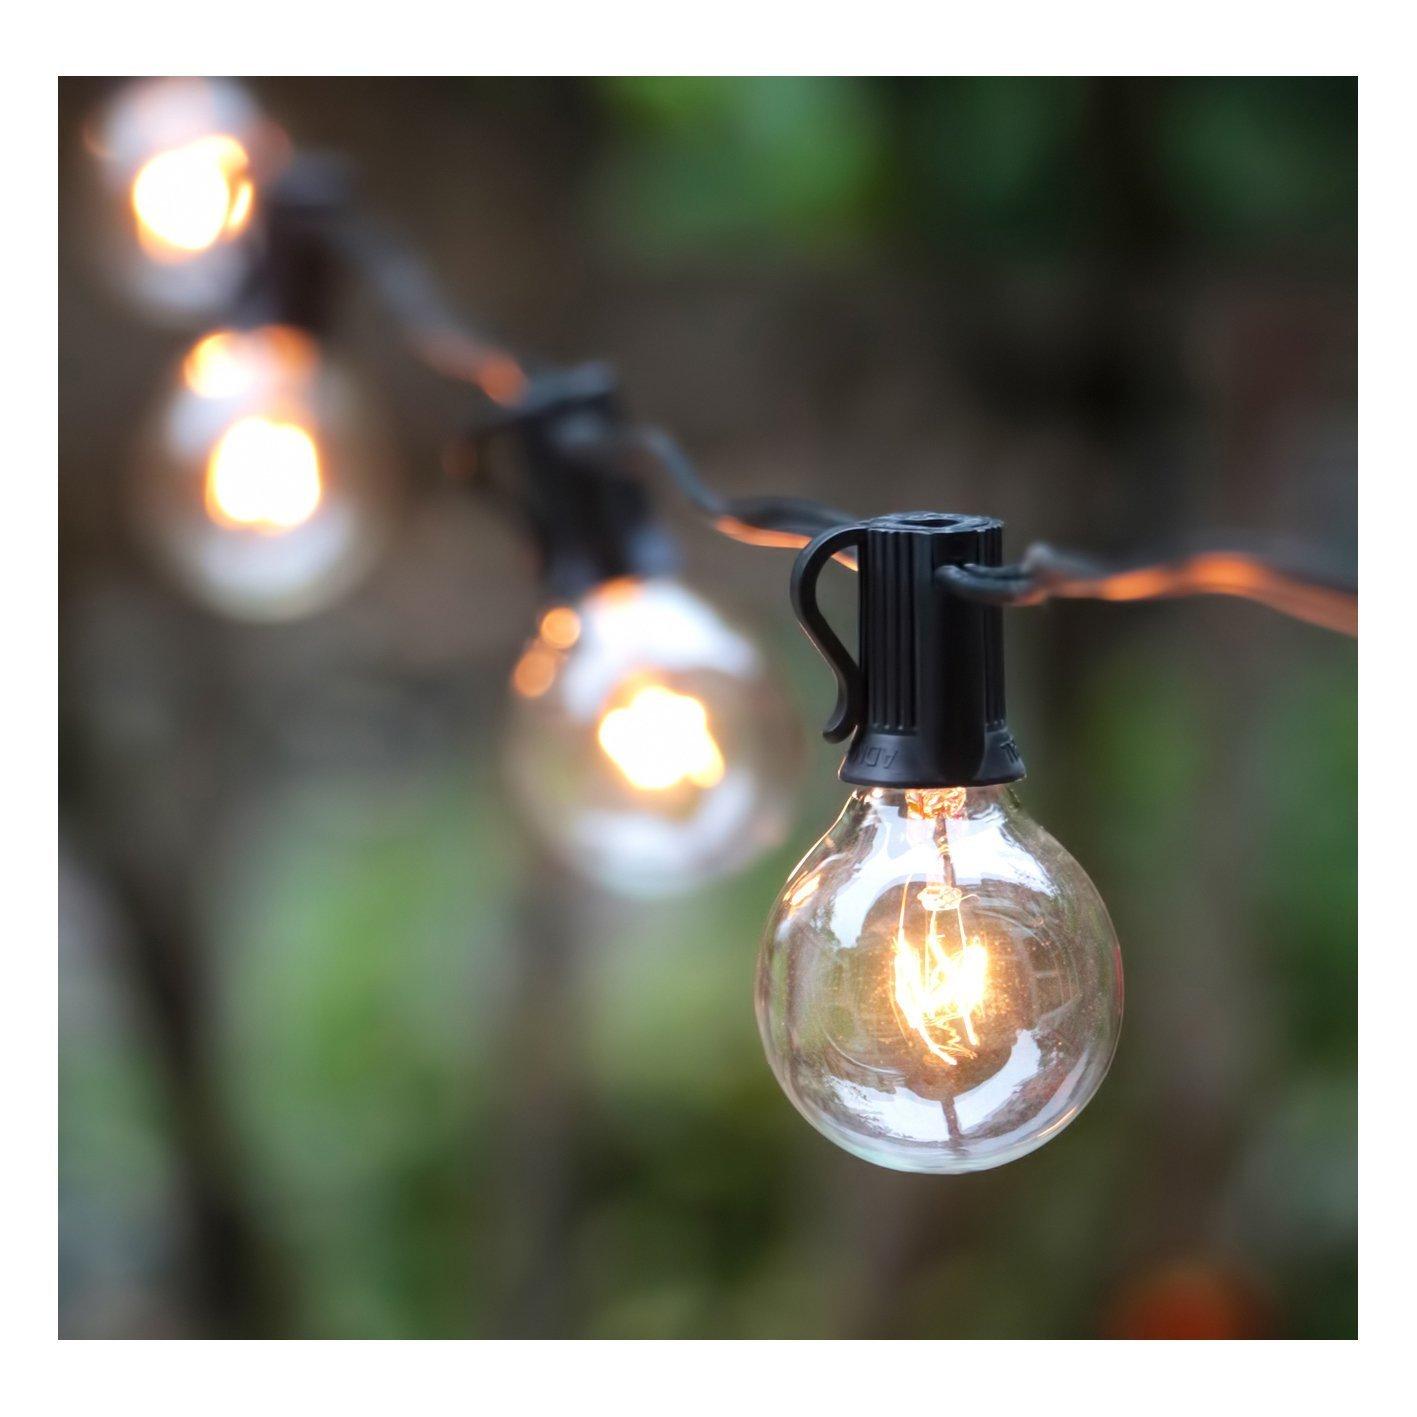 100Ft Outdoor Patio String Lights with 100 Clear Globe G40 Bulbs,UL Certified for Patio Porch Backyard Deck Bistro Gazebos Pergolas Balcony Wedding Gathering Parties Markets Decor, Black